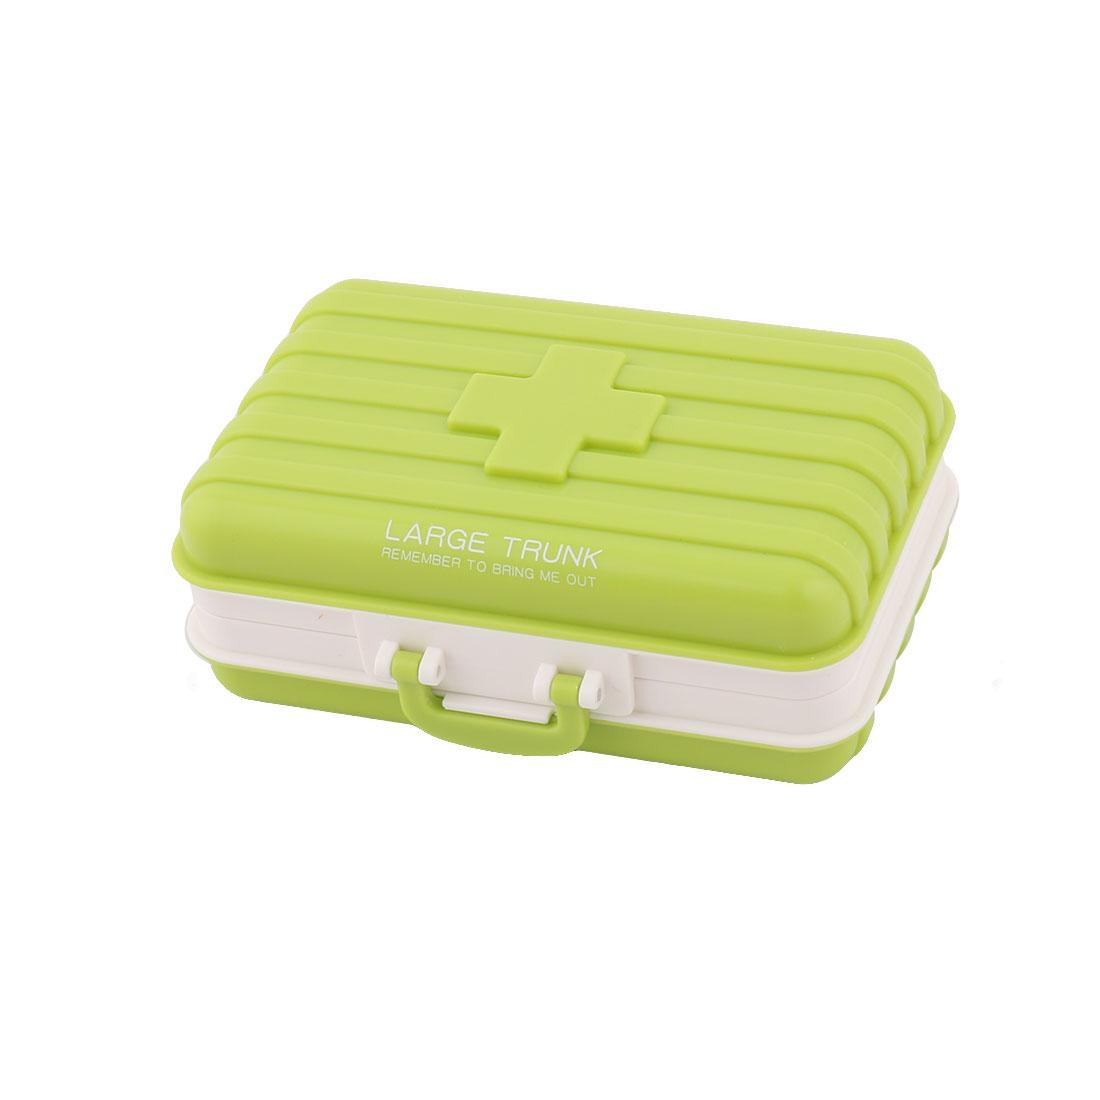 Plastic Suitcase Design 6 Slots Medicine Pill Capsule Storage Box Organizer Green